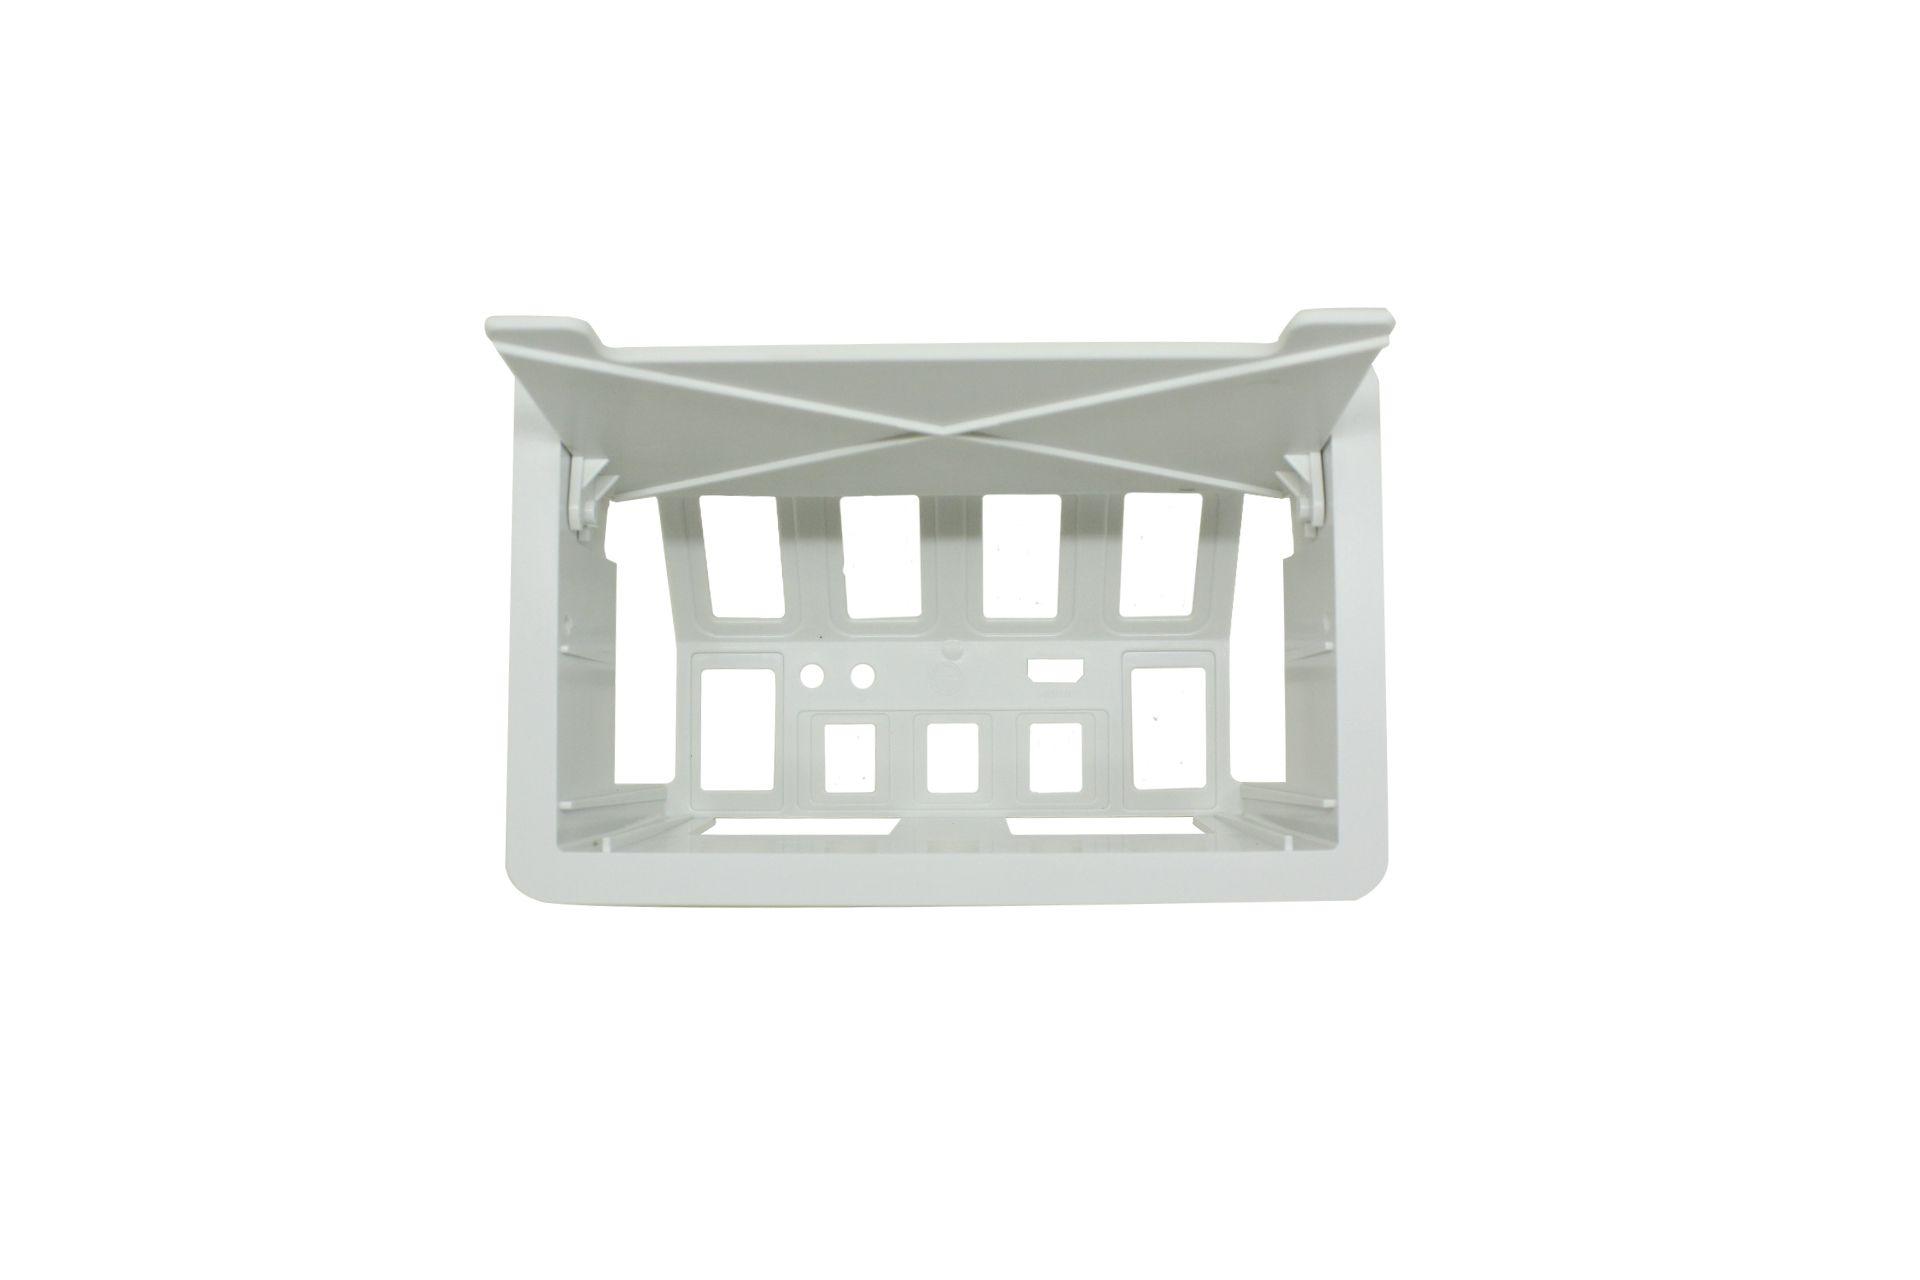 Caixa De Tomada p/ Embutir Mesa Hdmi Rede Caixa Vazia Branca